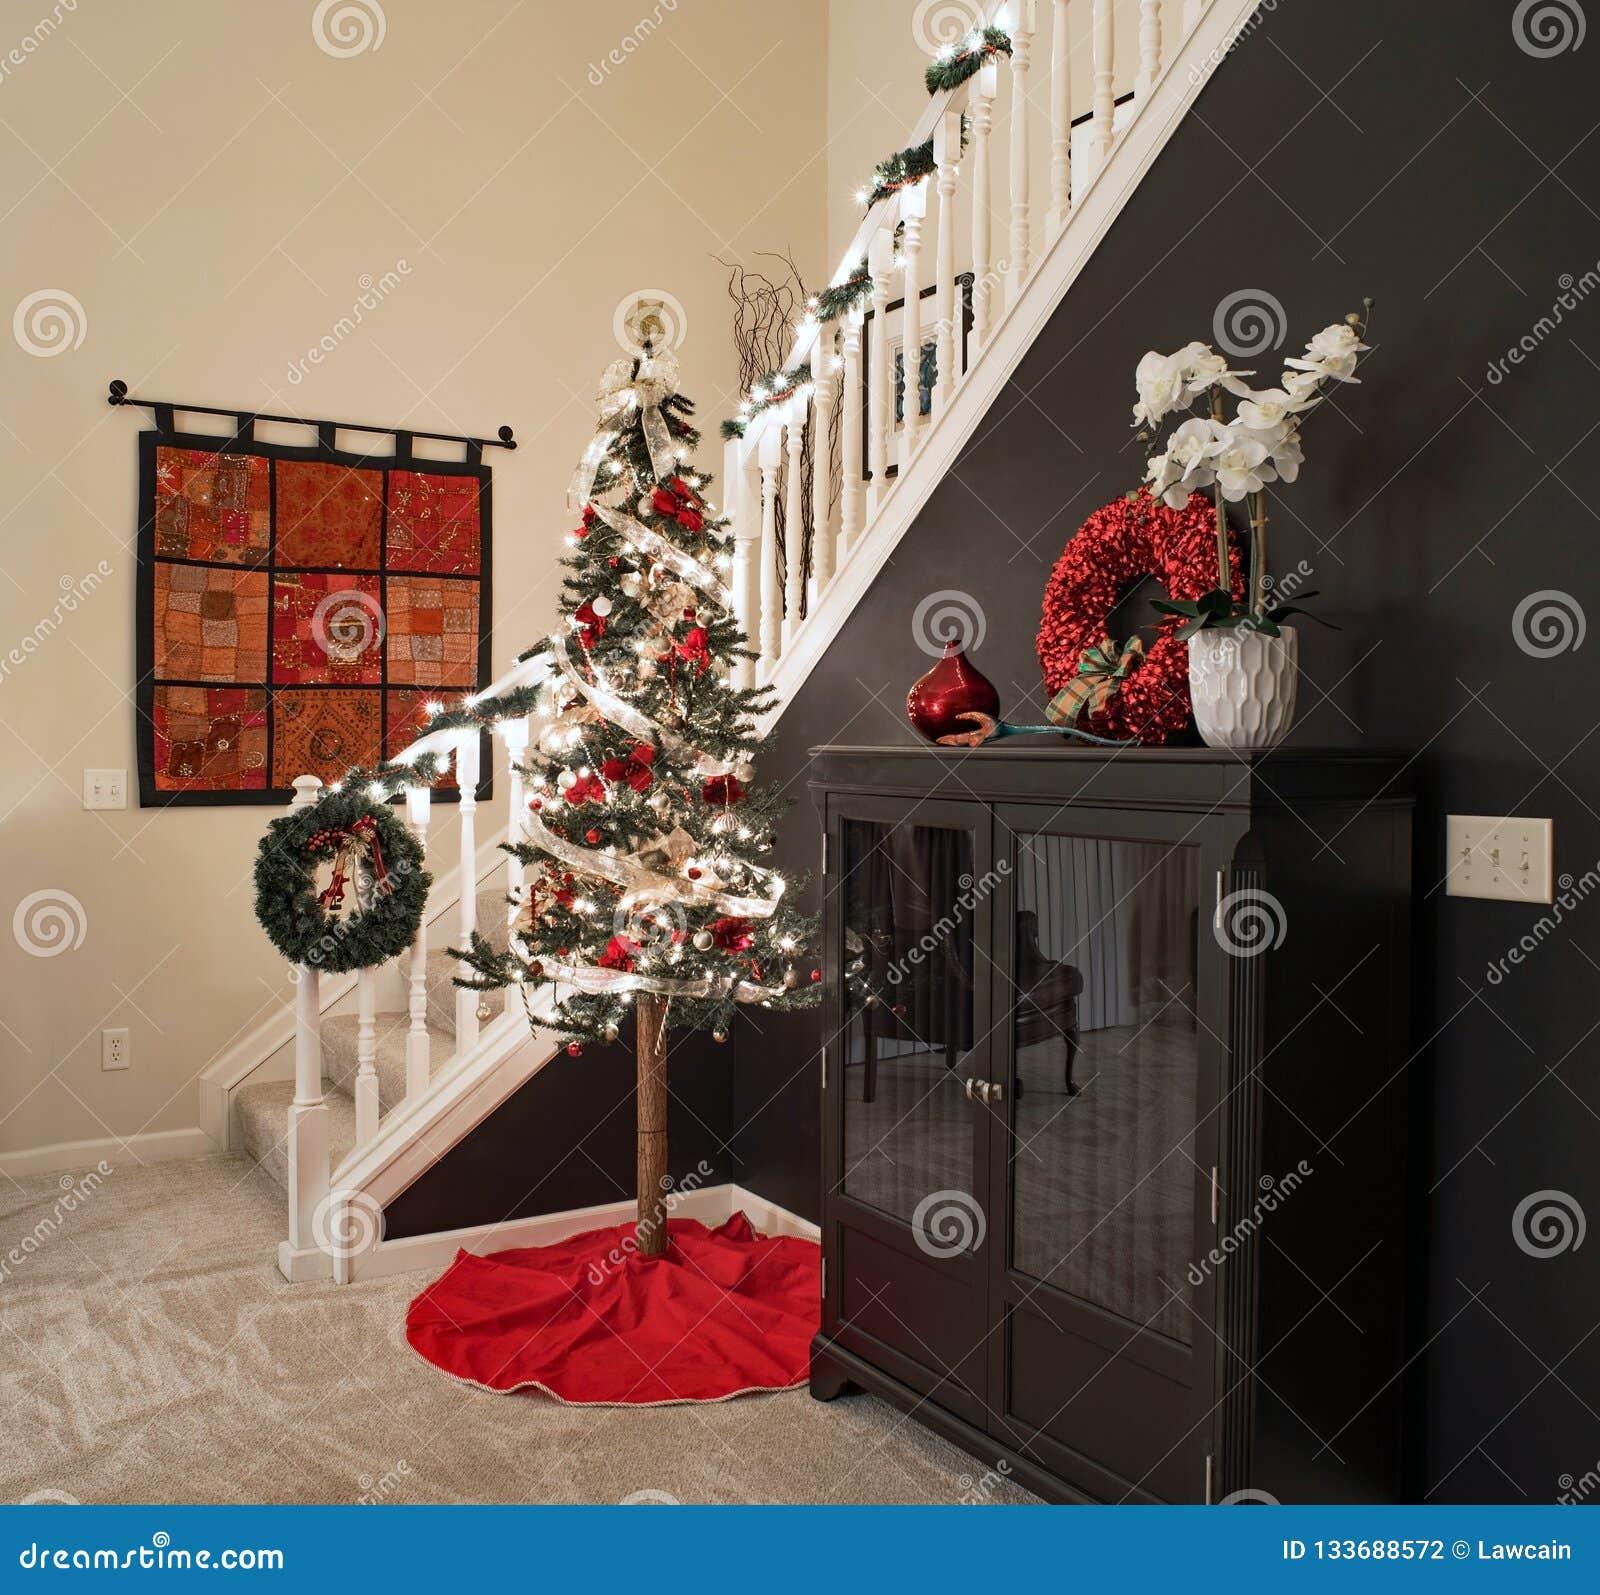 Alpine Christmas Tree By Stairway Stock Photo Image Of Lifestyle Gray 133688572